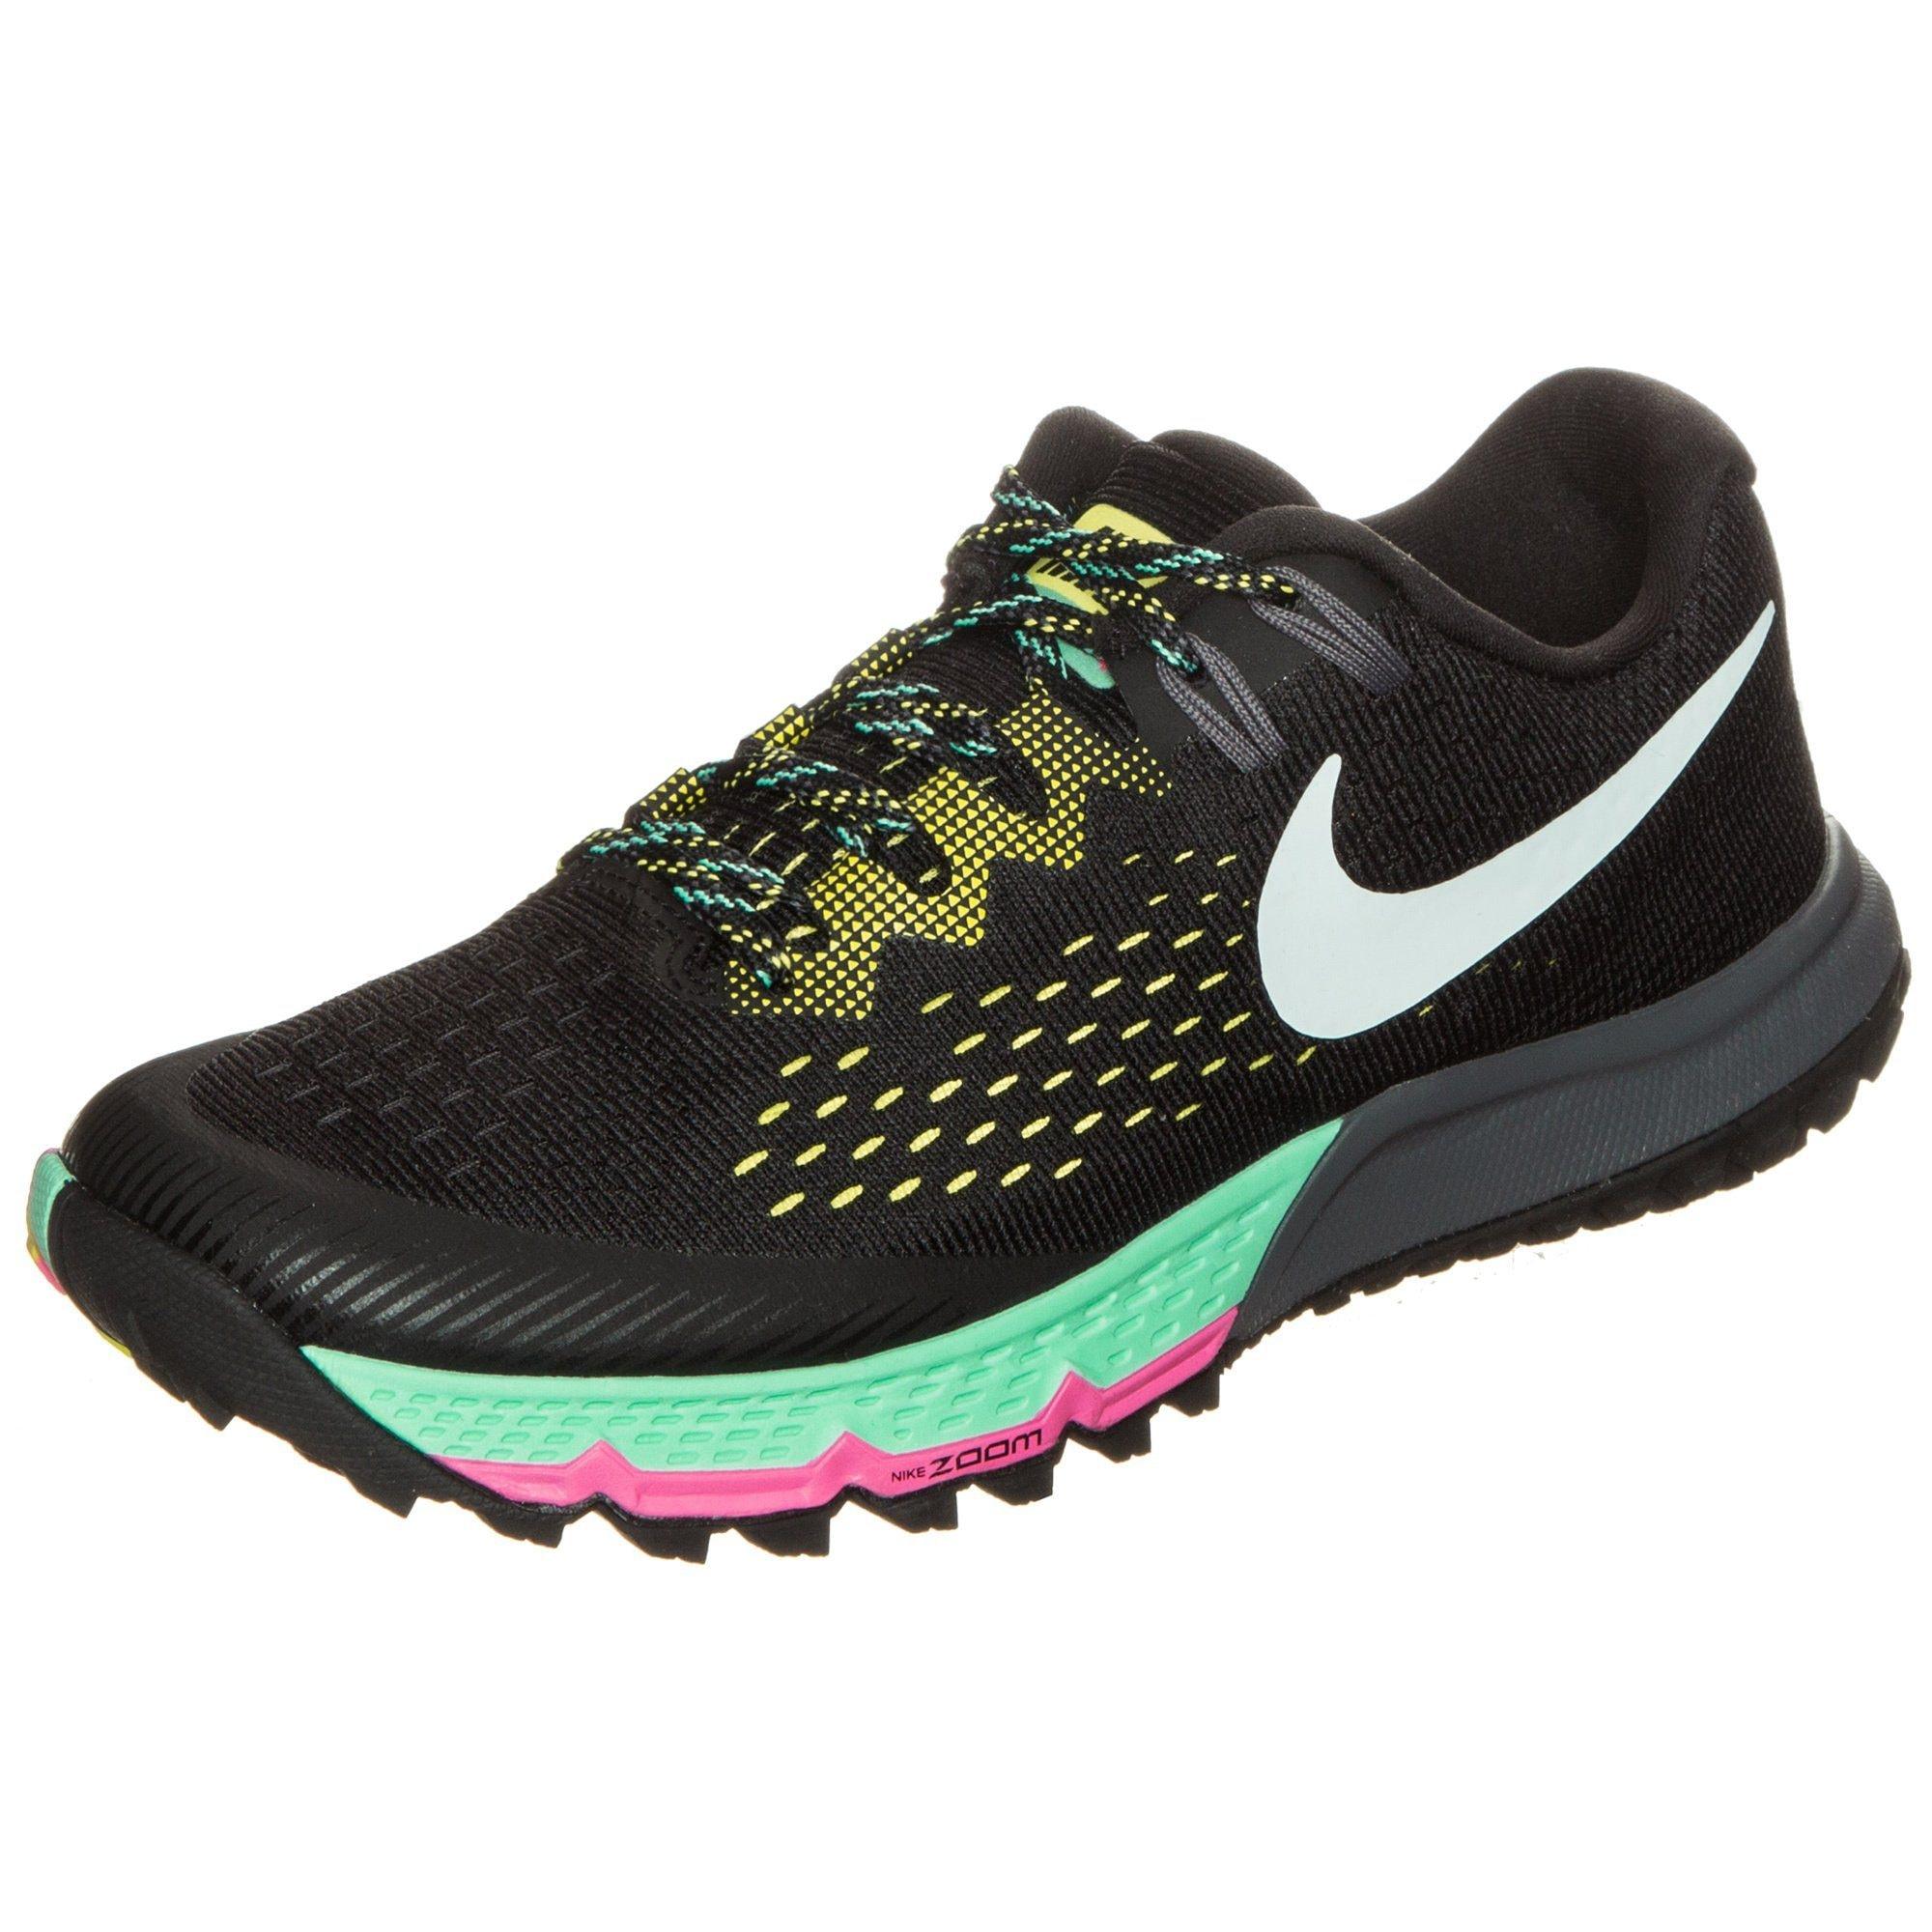 Herrliche Nike Laufschuhe Frauen Laufschuhe Air Zoom